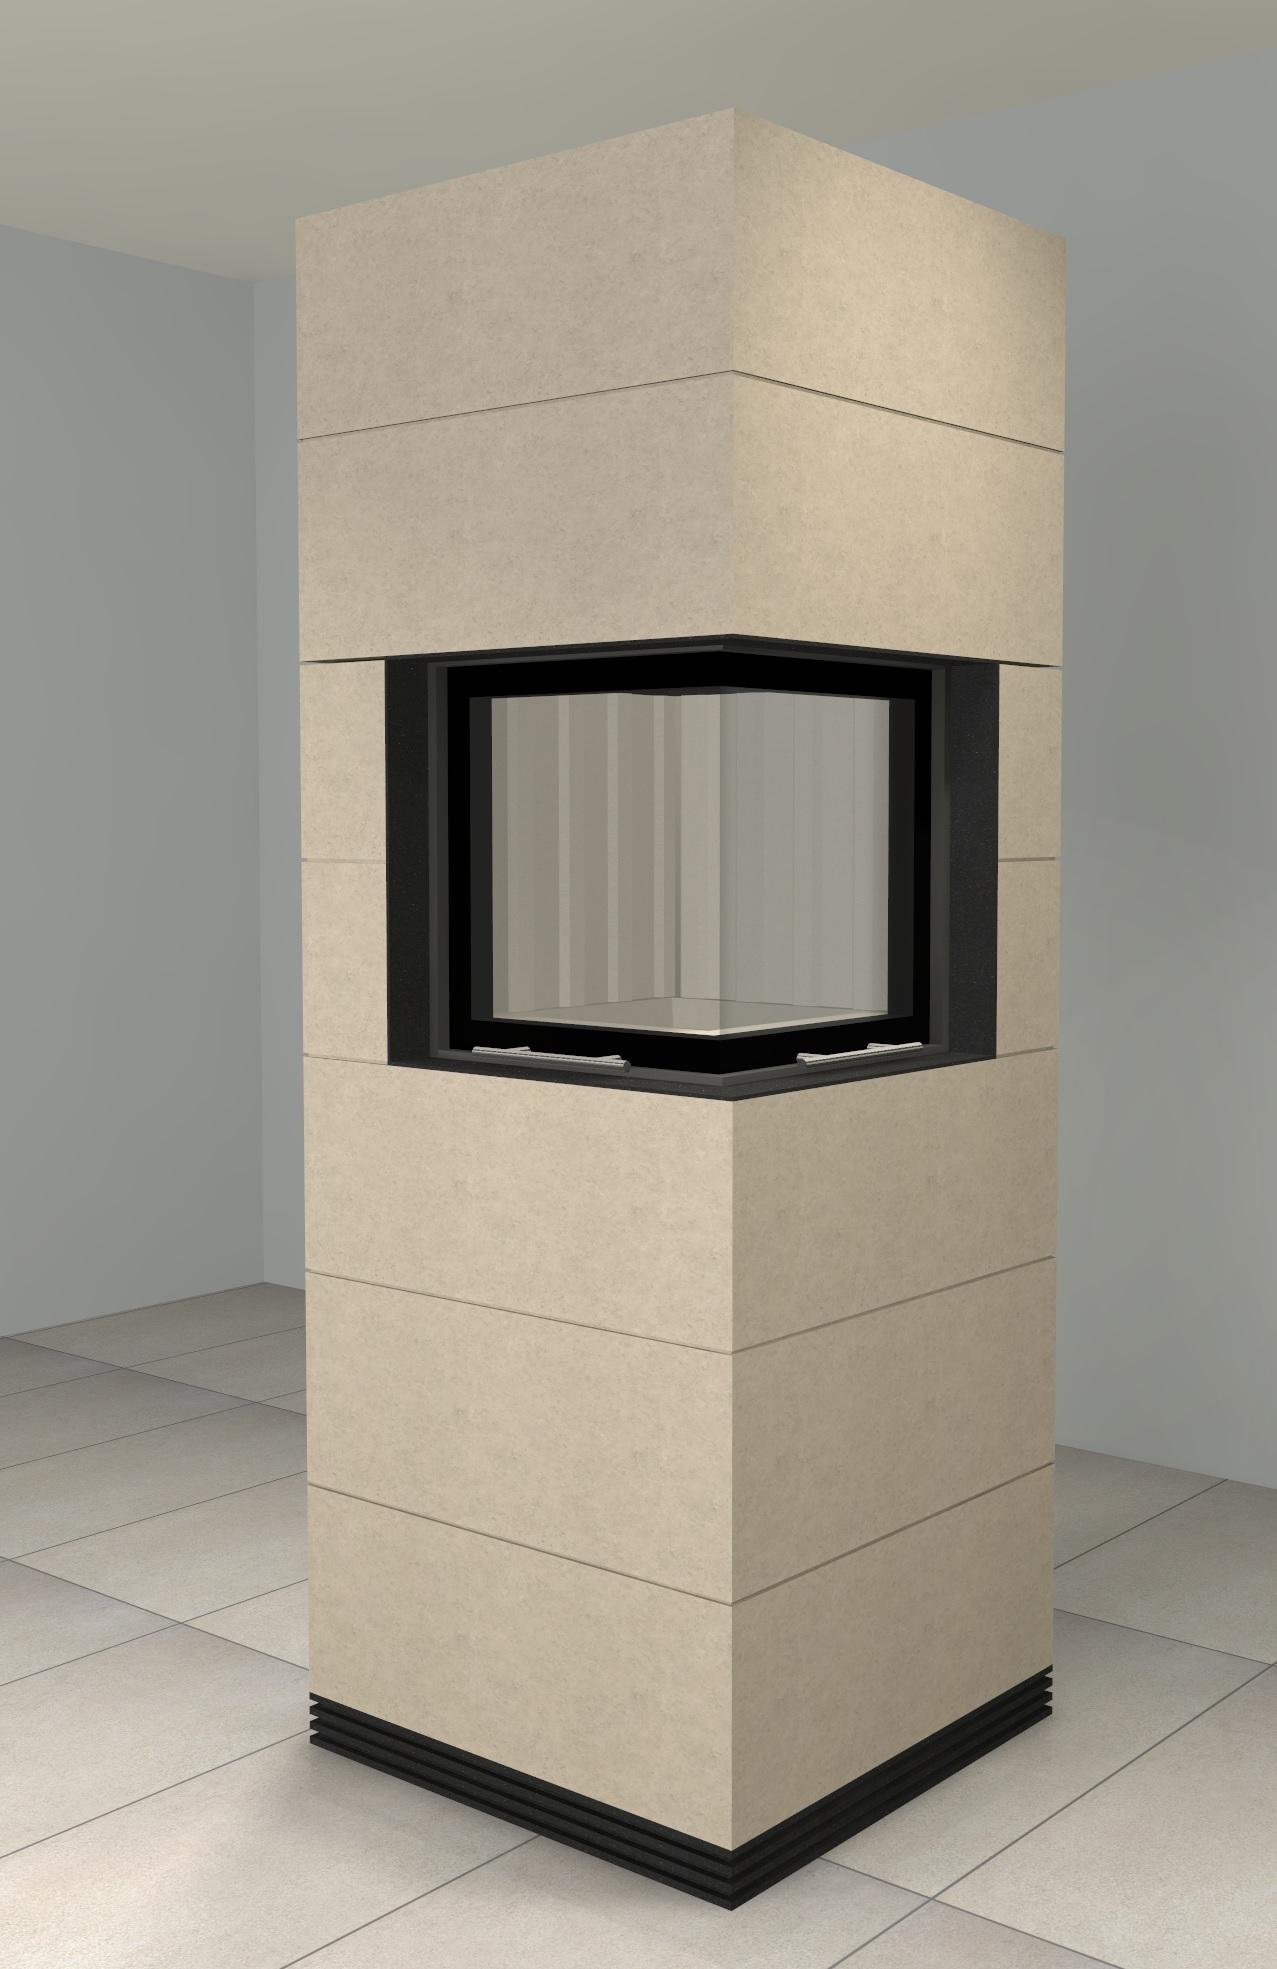 spartherm sim 3 2 mini 2lrh 4s mit montage. Black Bedroom Furniture Sets. Home Design Ideas